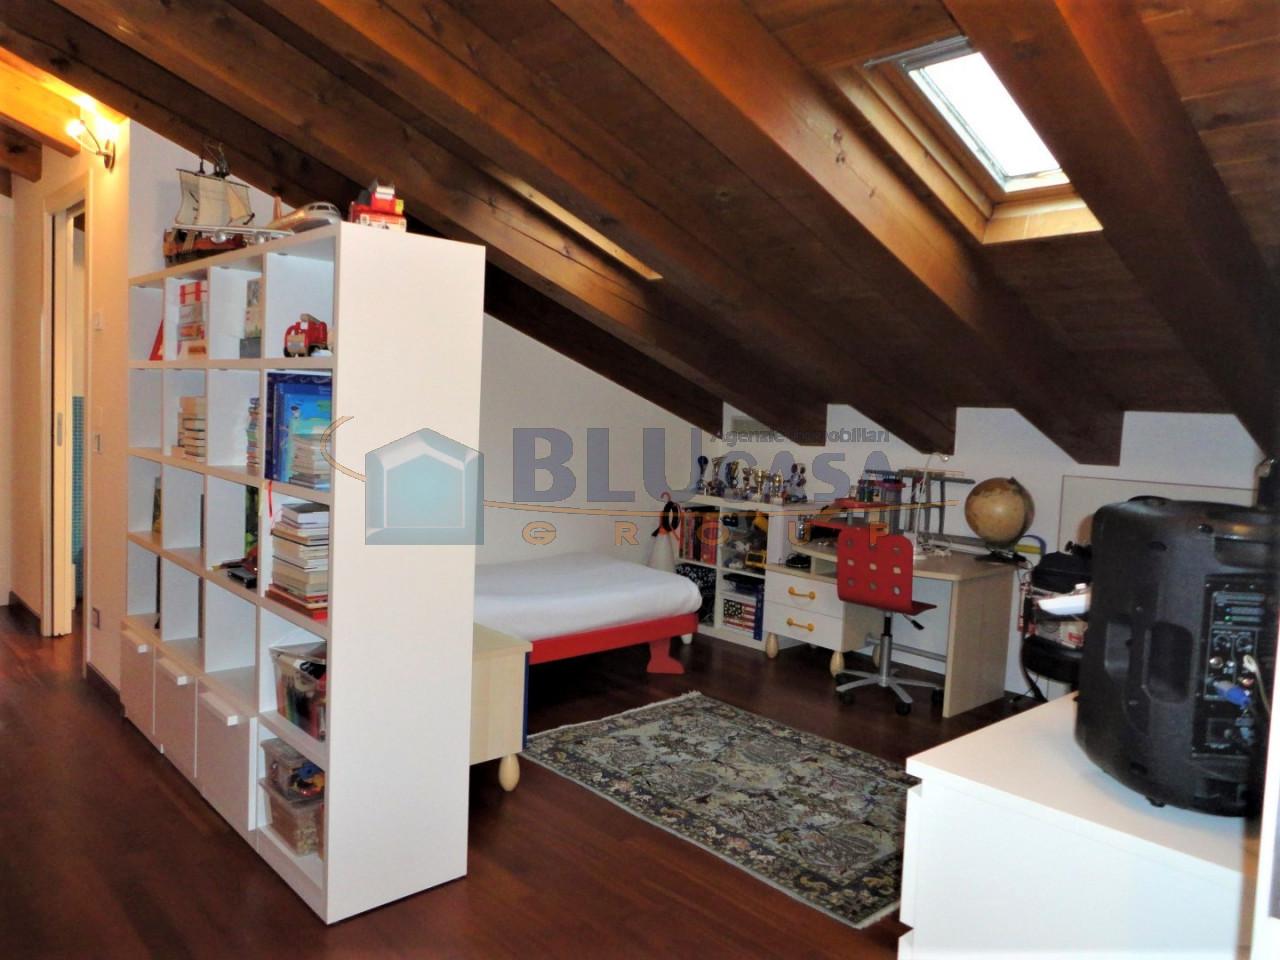 D296 Elegante duplex tricamere con ottime finiture in vendita a Montegrotto Terme https://media.gestionaleimmobiliare.it/foto/annunci/200215/2167876/1280x1280/029__31_camera__large.jpg